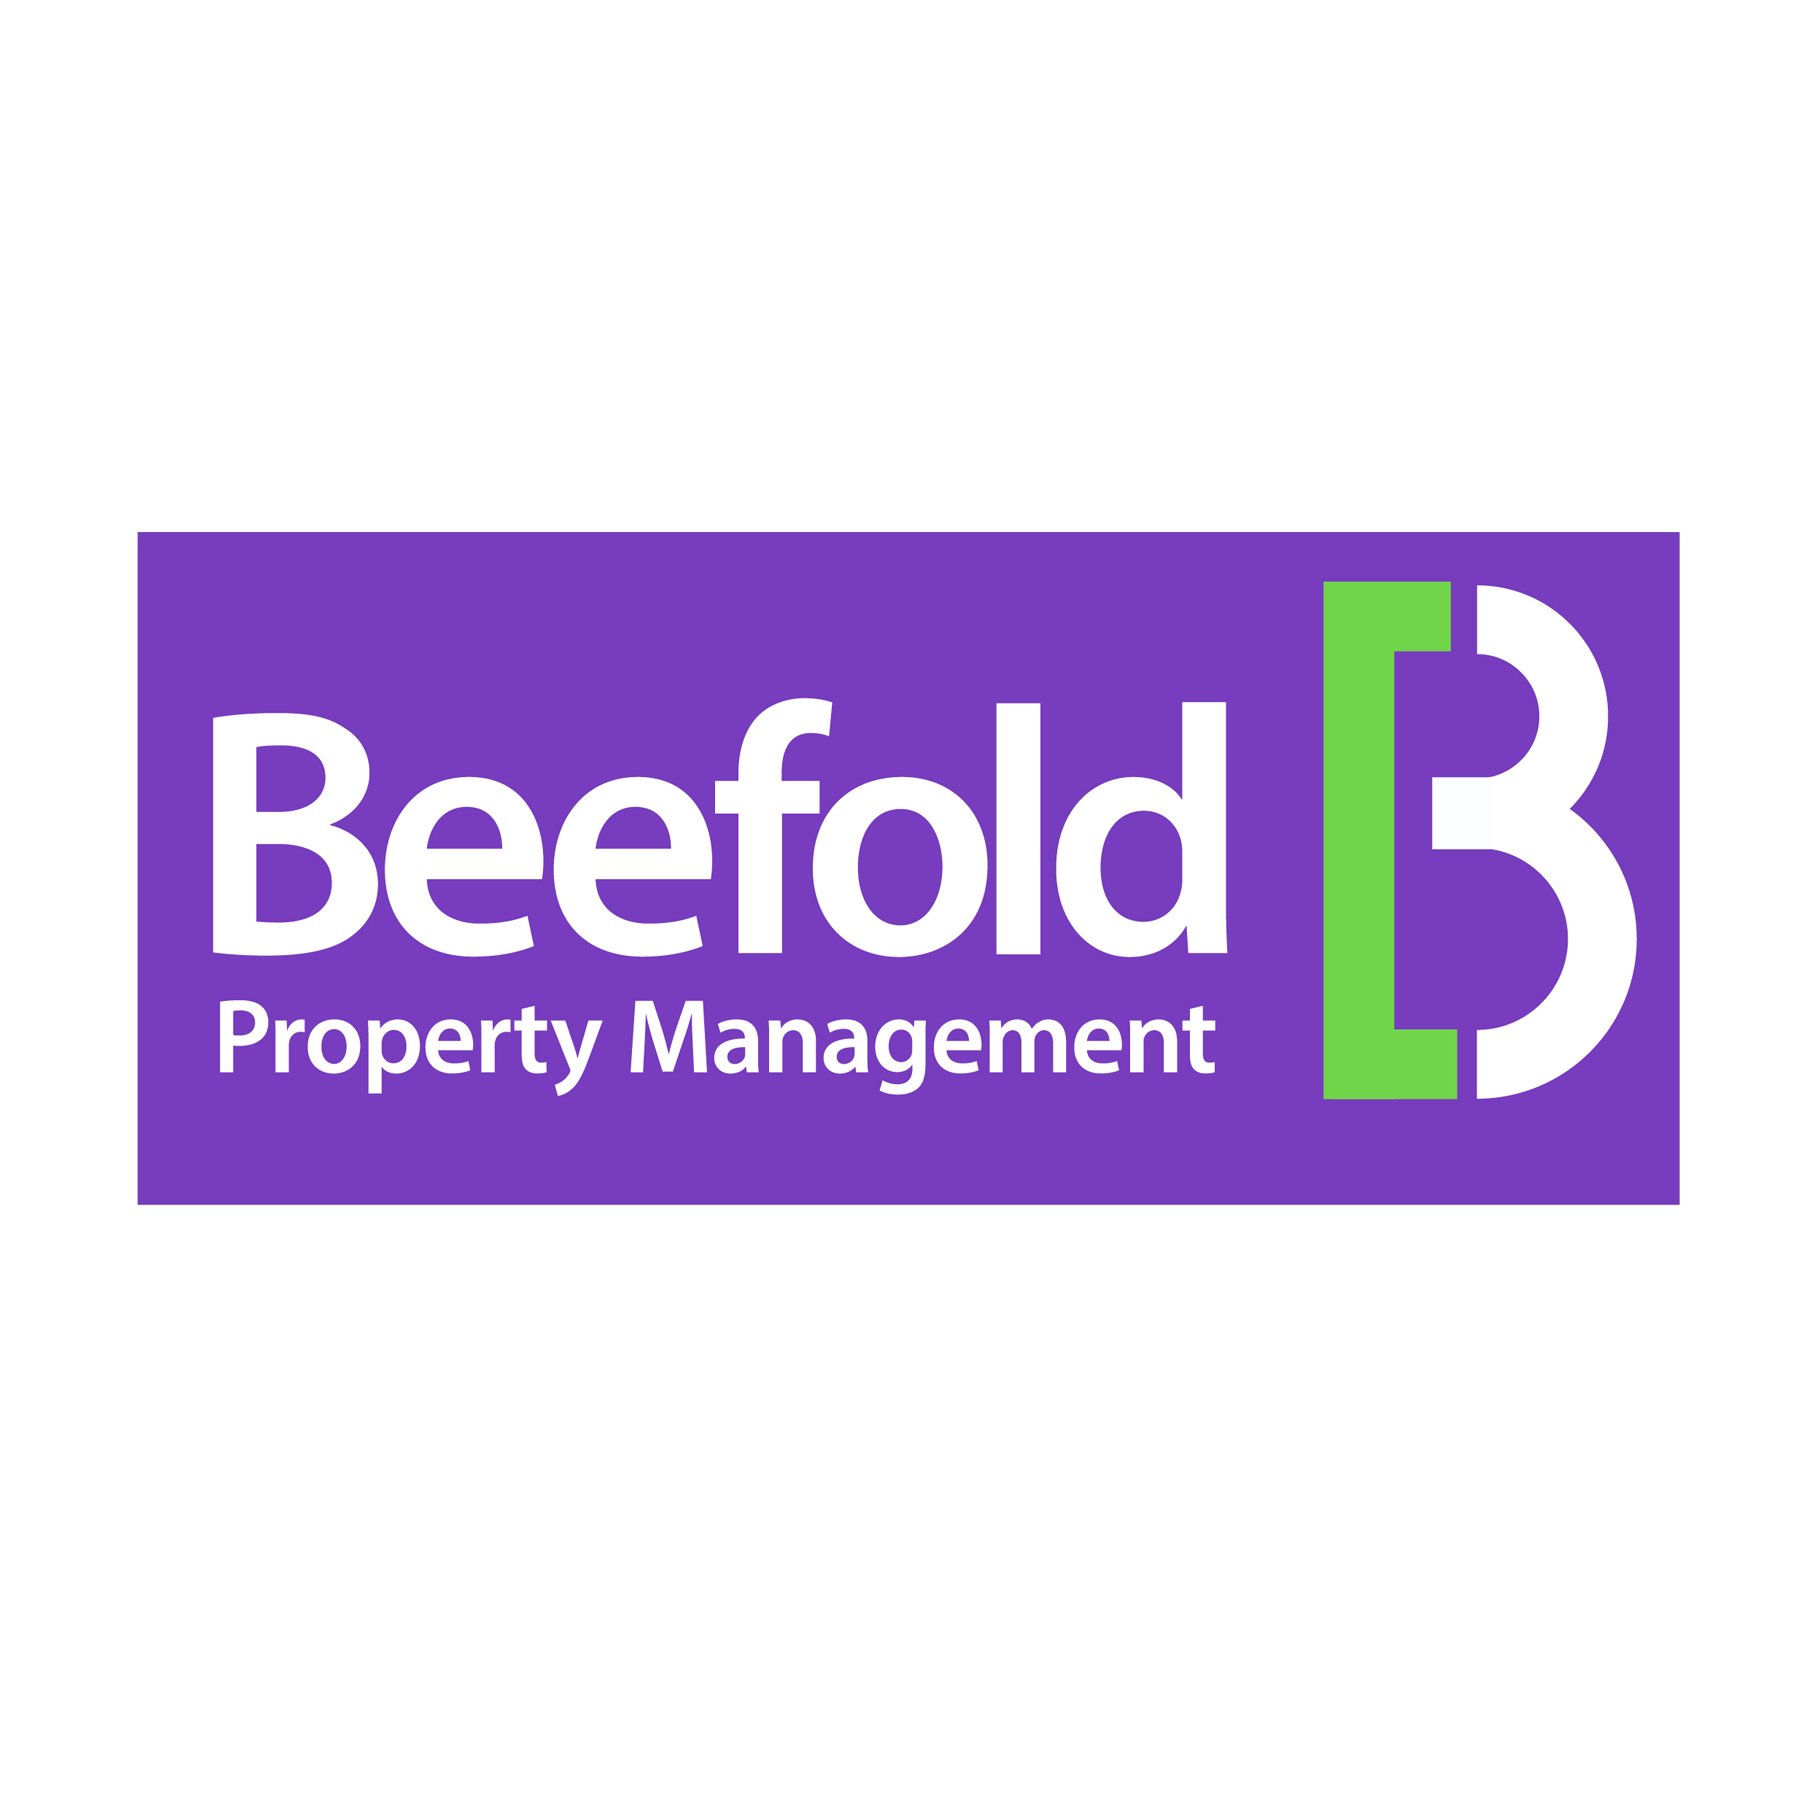 Beefold Property Management Logo